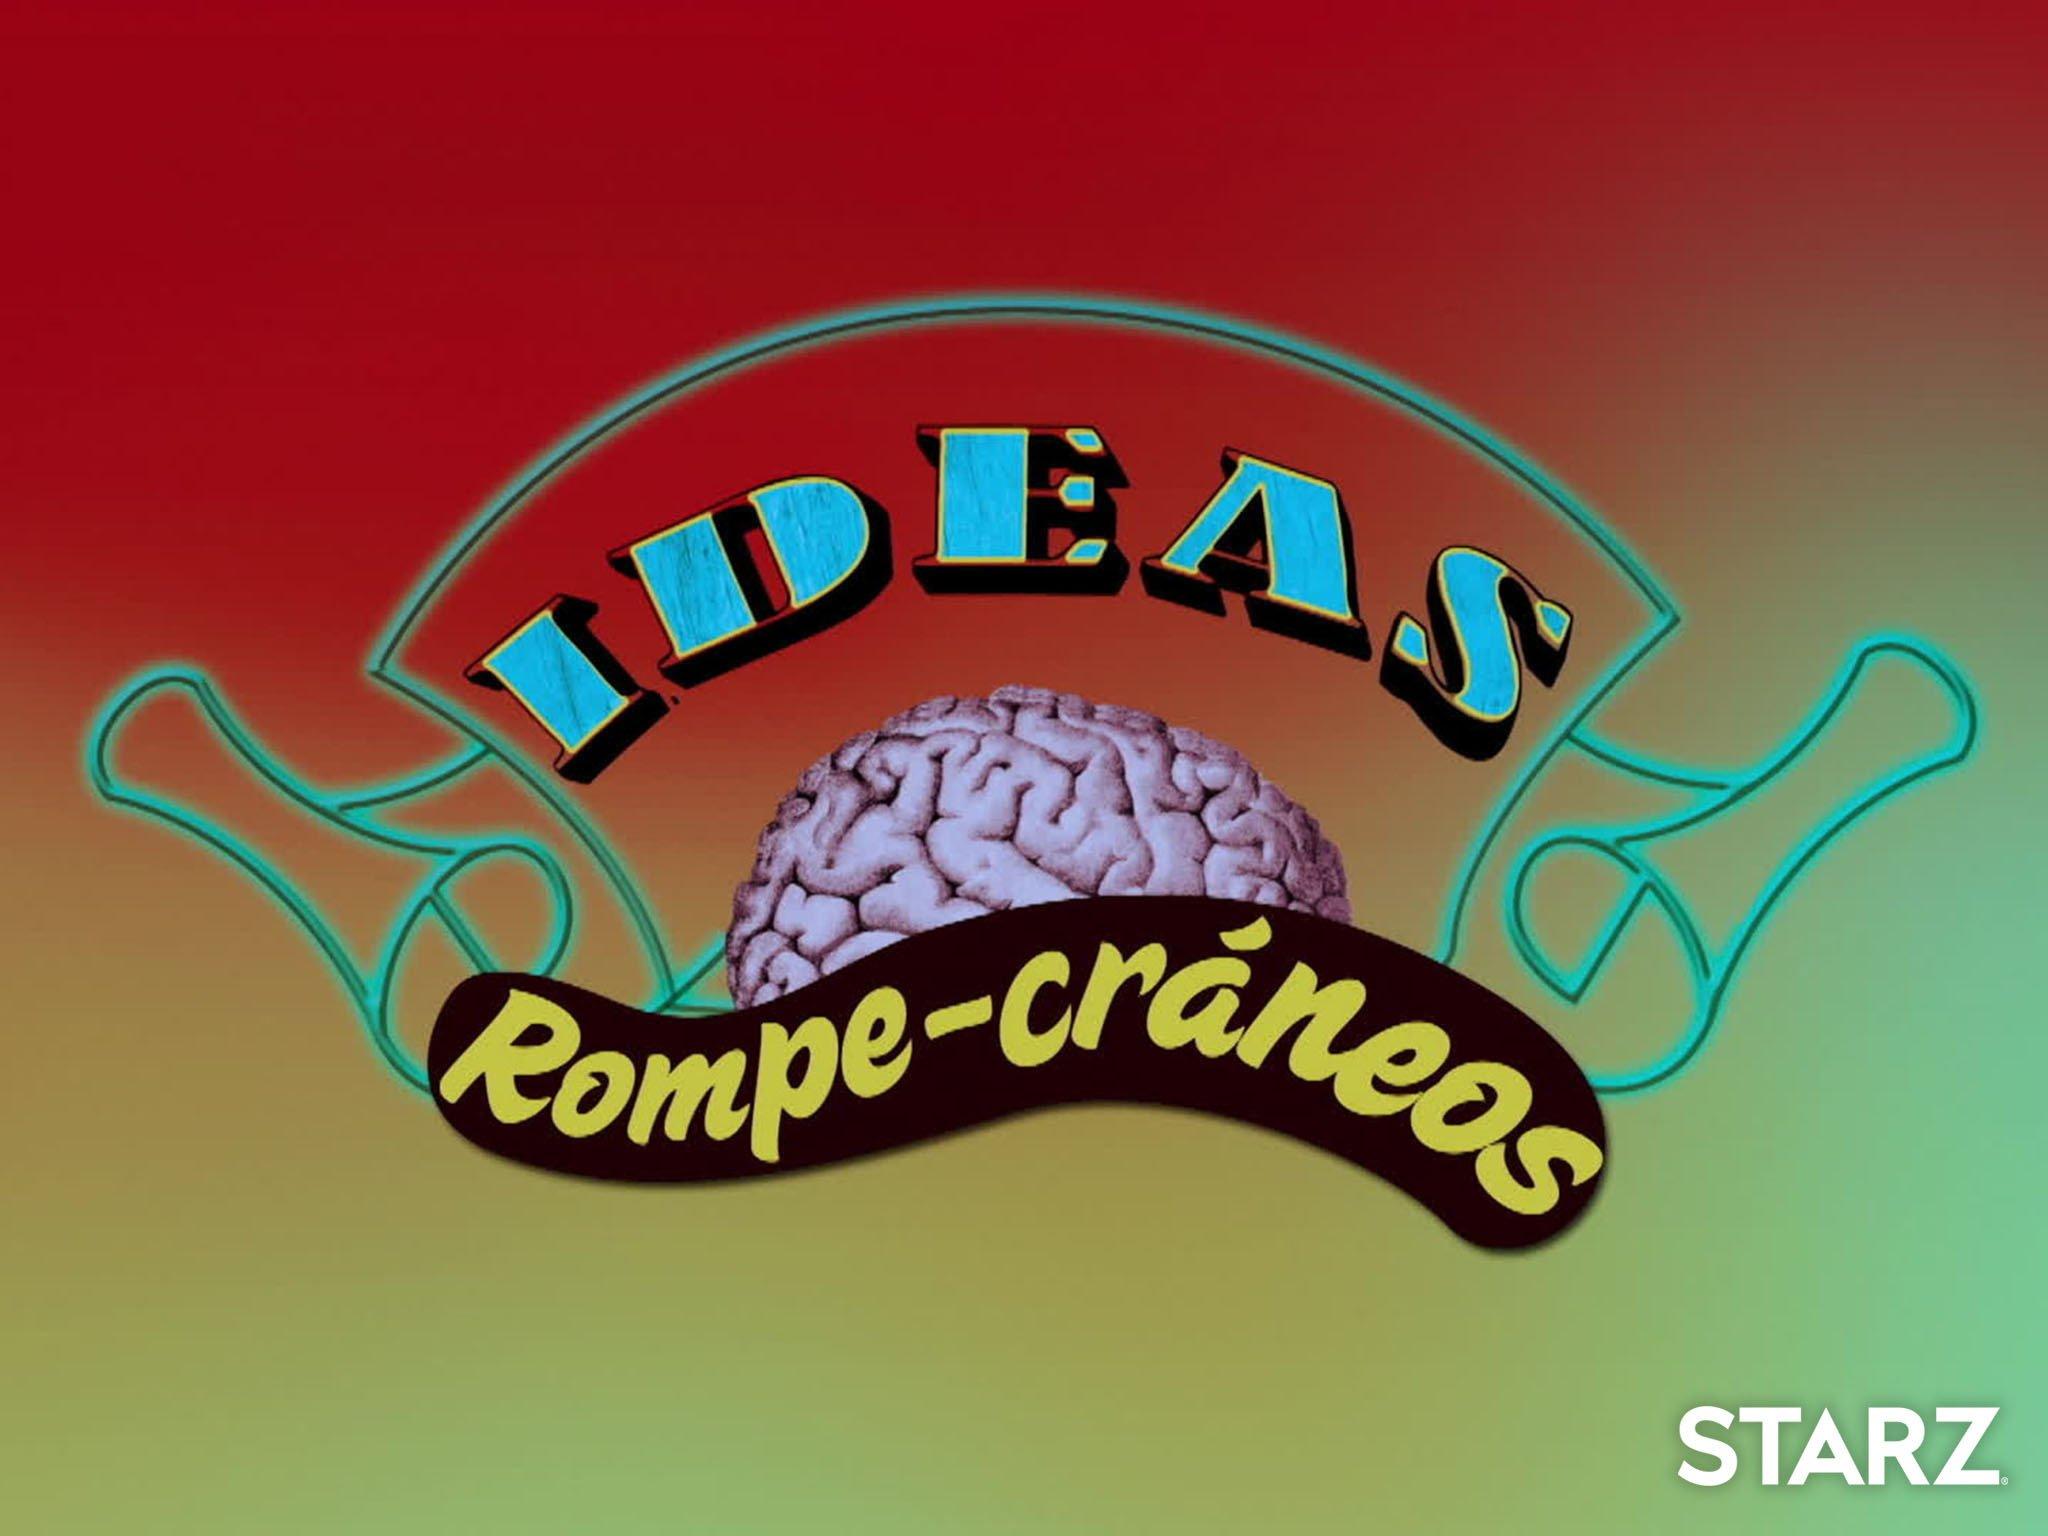 Amazon.com: Ideas Rompe-Cráneos: Leto Dugatkin, Natalia Rosminati, Andres Burecovics, Federico Badia